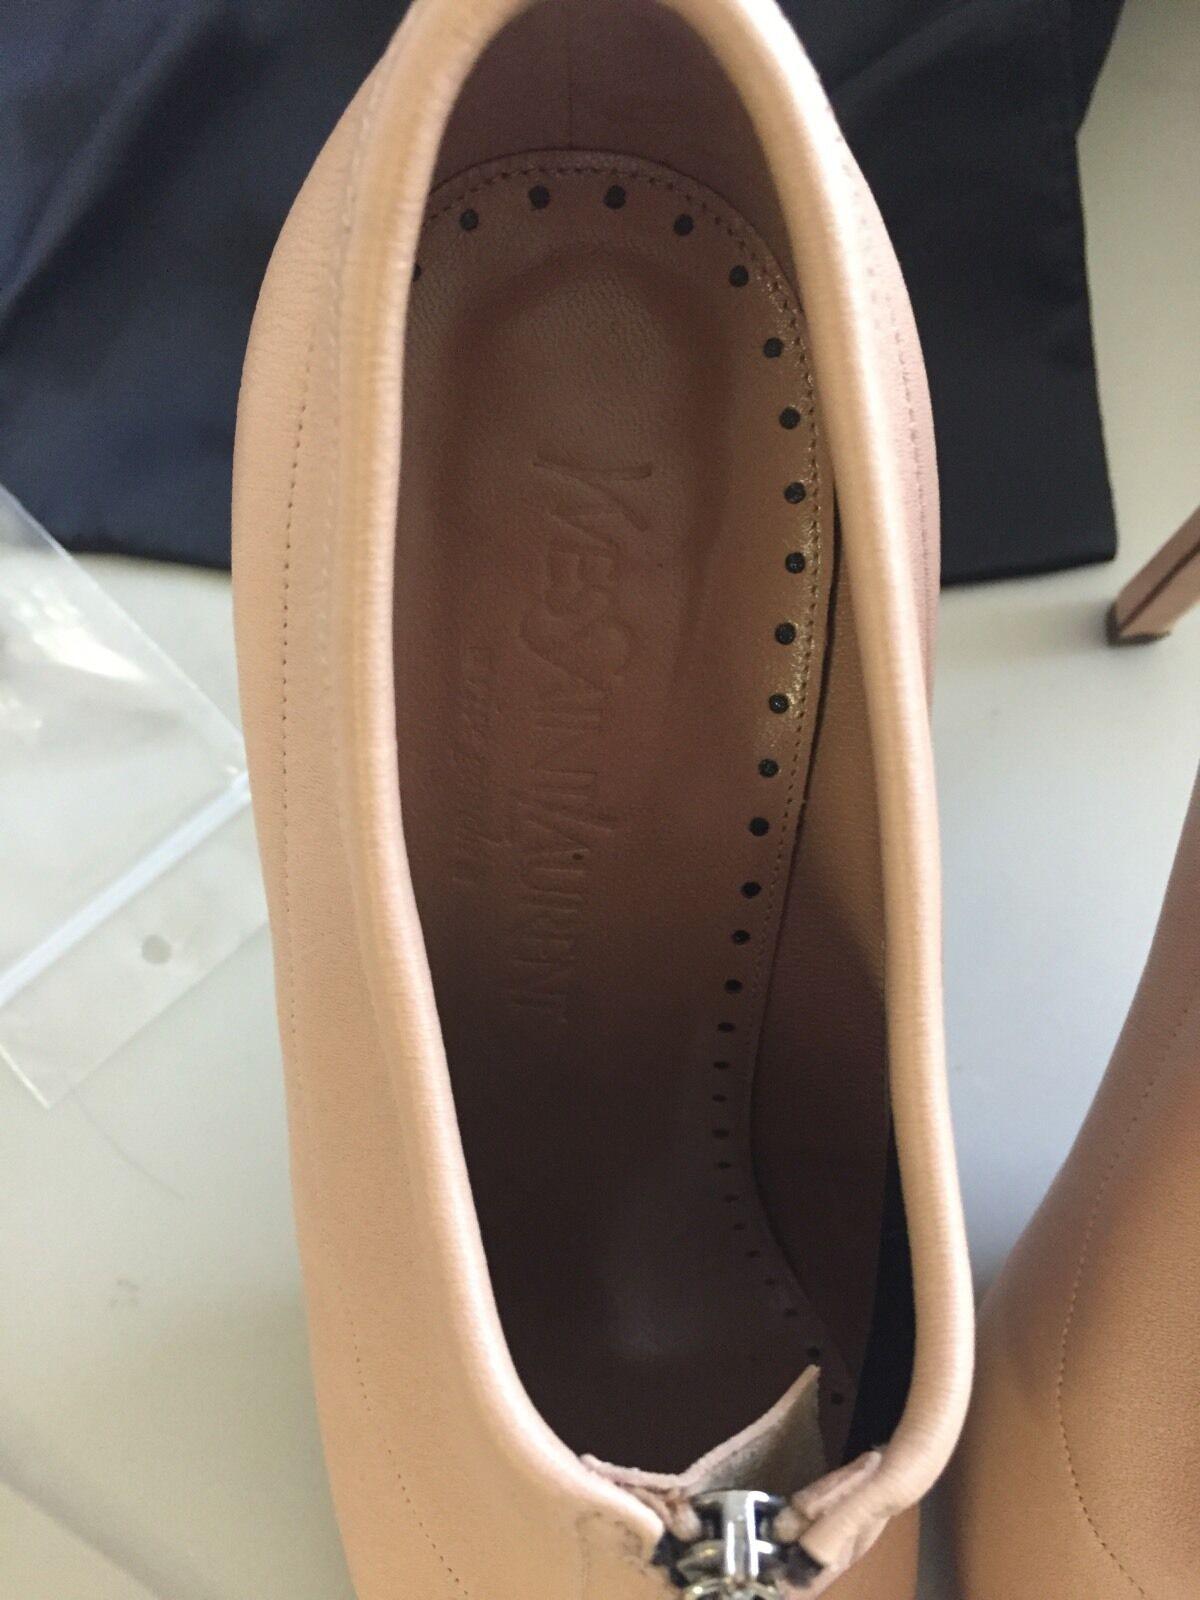 YSL bluesh Nude Pink Stretch Leather Leather Leather Joan Bootie Heels Zip Peep Toe 39.5  550 b9c2b1